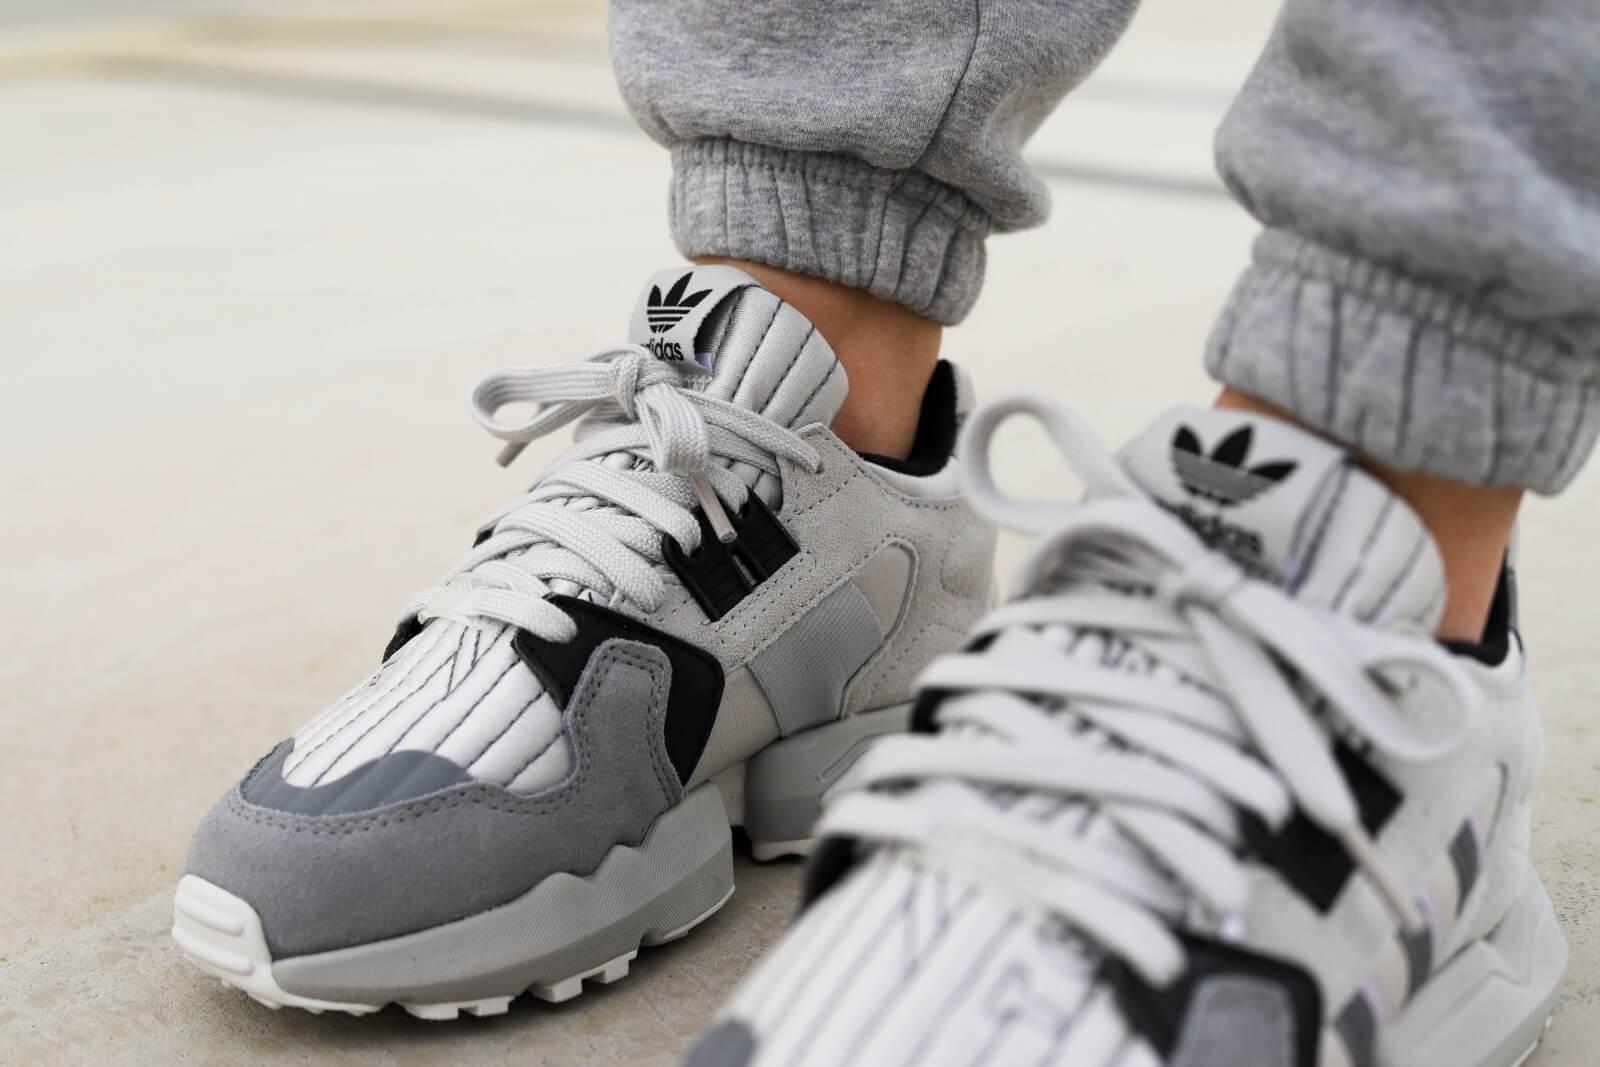 Adidas Women's ZX Torsion Grey One/Grey Two